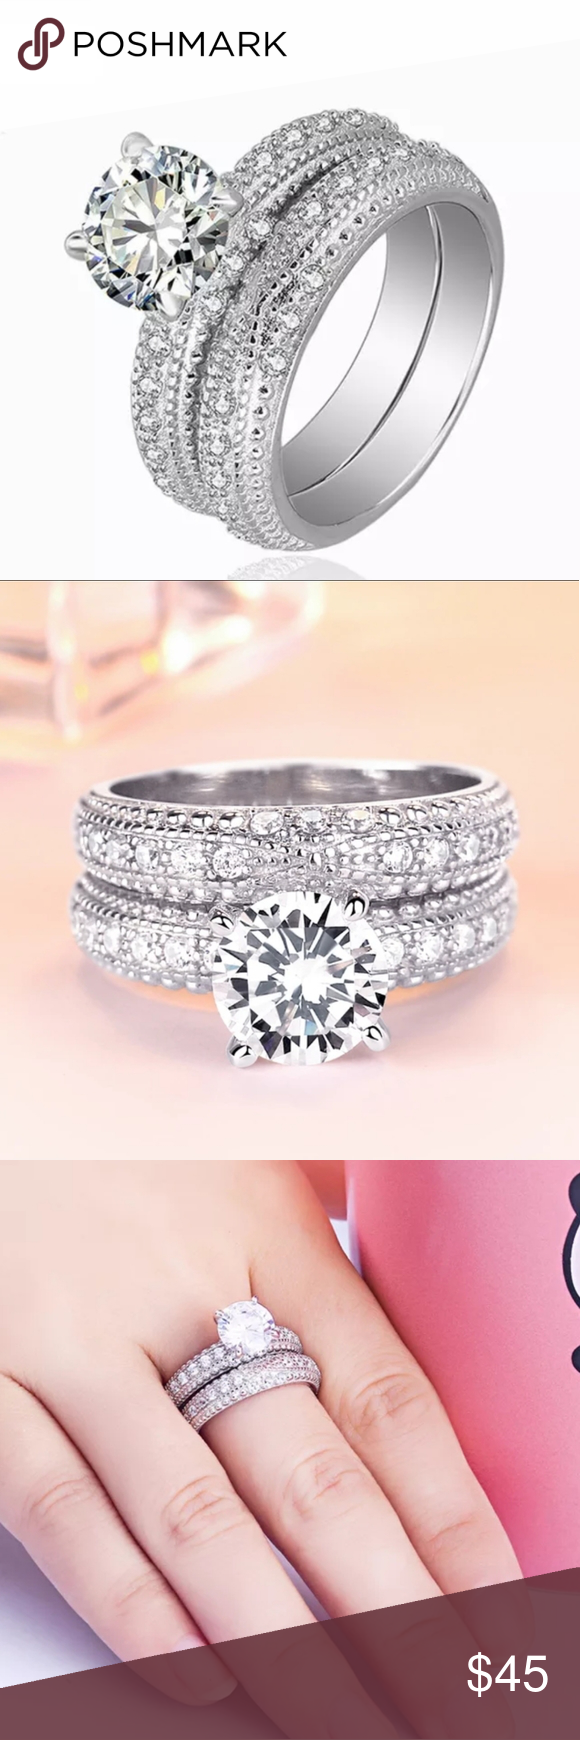 925 Sterling Silver Cz Wedding Ring Set Cz Wedding Ring Sets Wedding Ring Sets Cz Wedding Rings